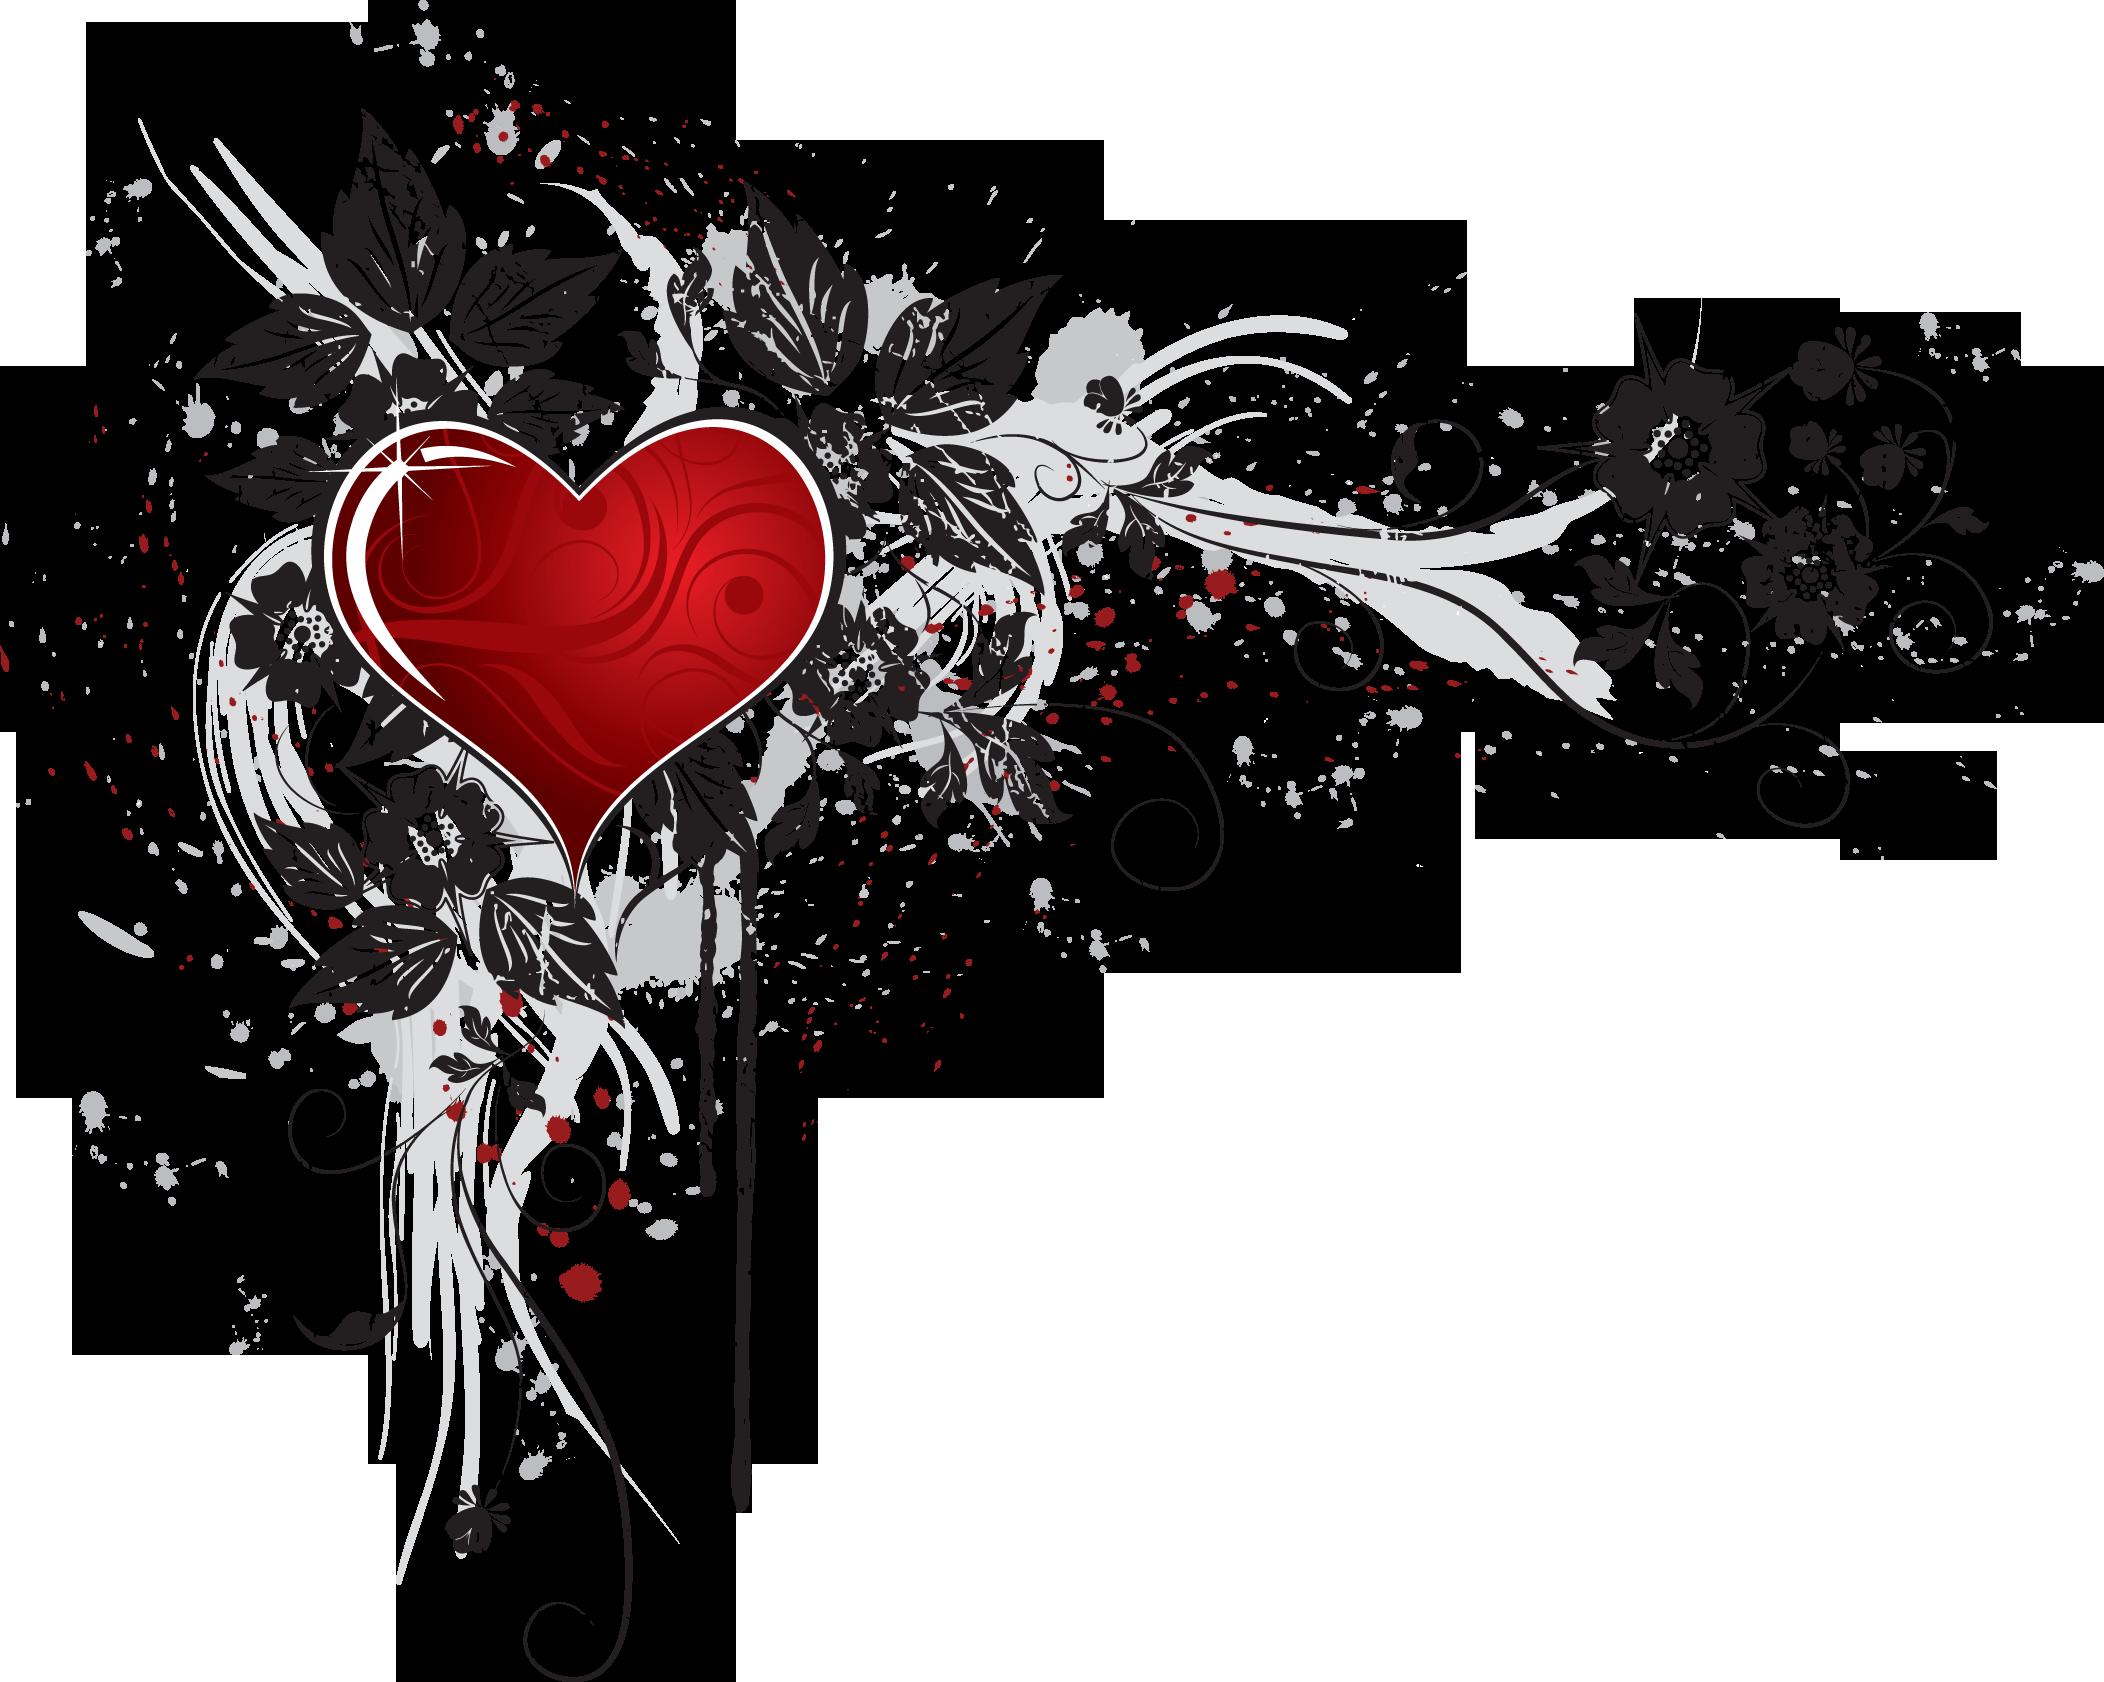 render cadre coeur feuille fleur sang autres inconnu png image r5u8ax clipart kid. Black Bedroom Furniture Sets. Home Design Ideas